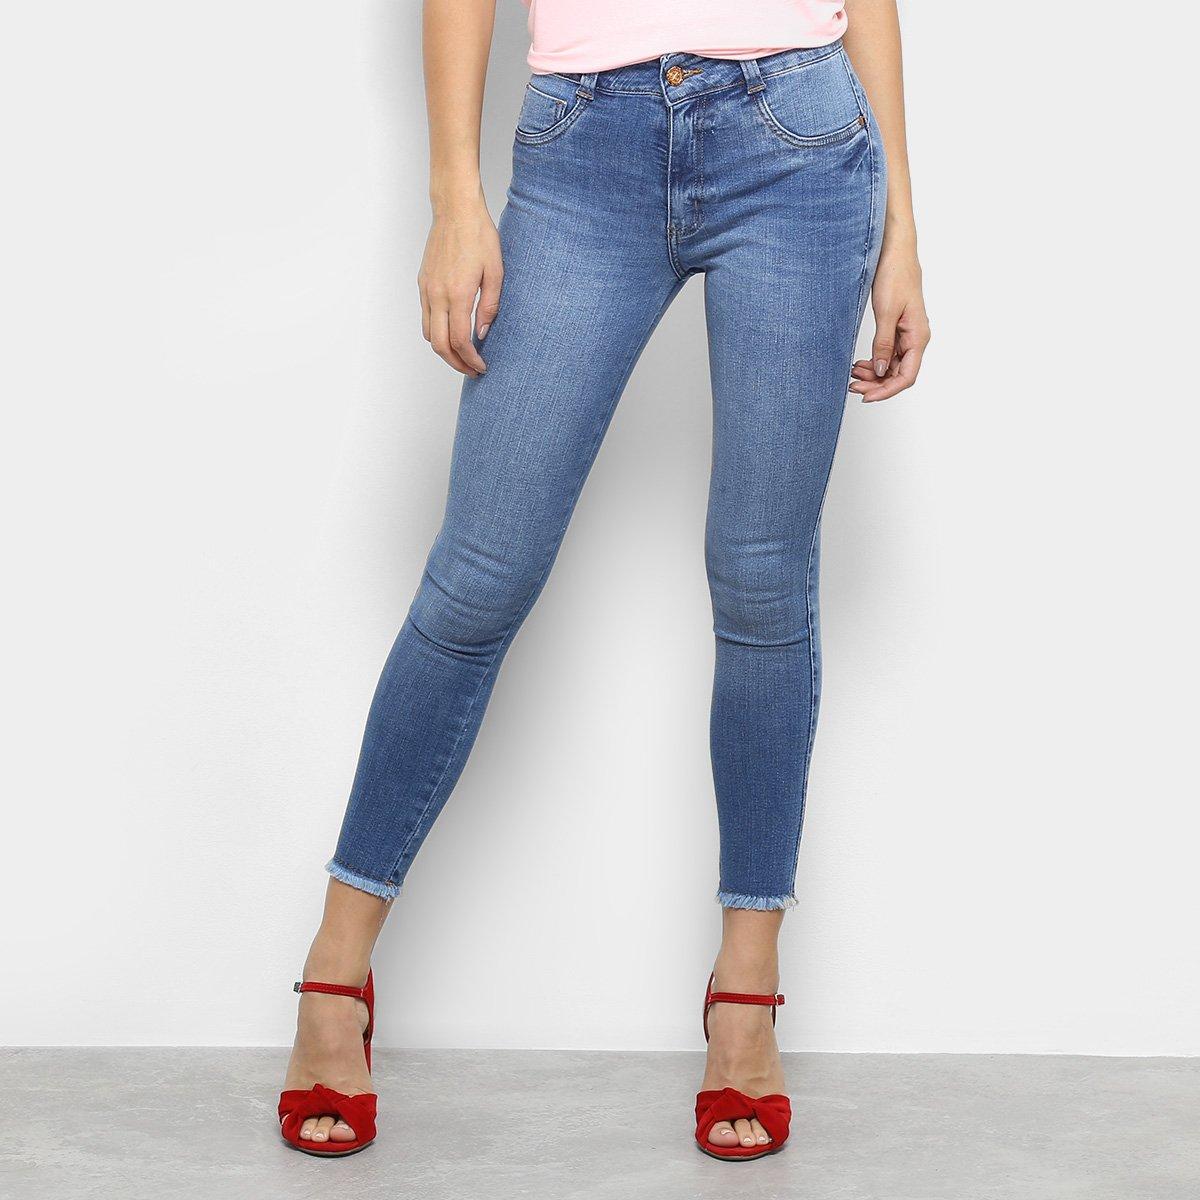 af04a5e48 Calça Jeans Skinny Biotipo Estonada Midi Cintura Média Feminina